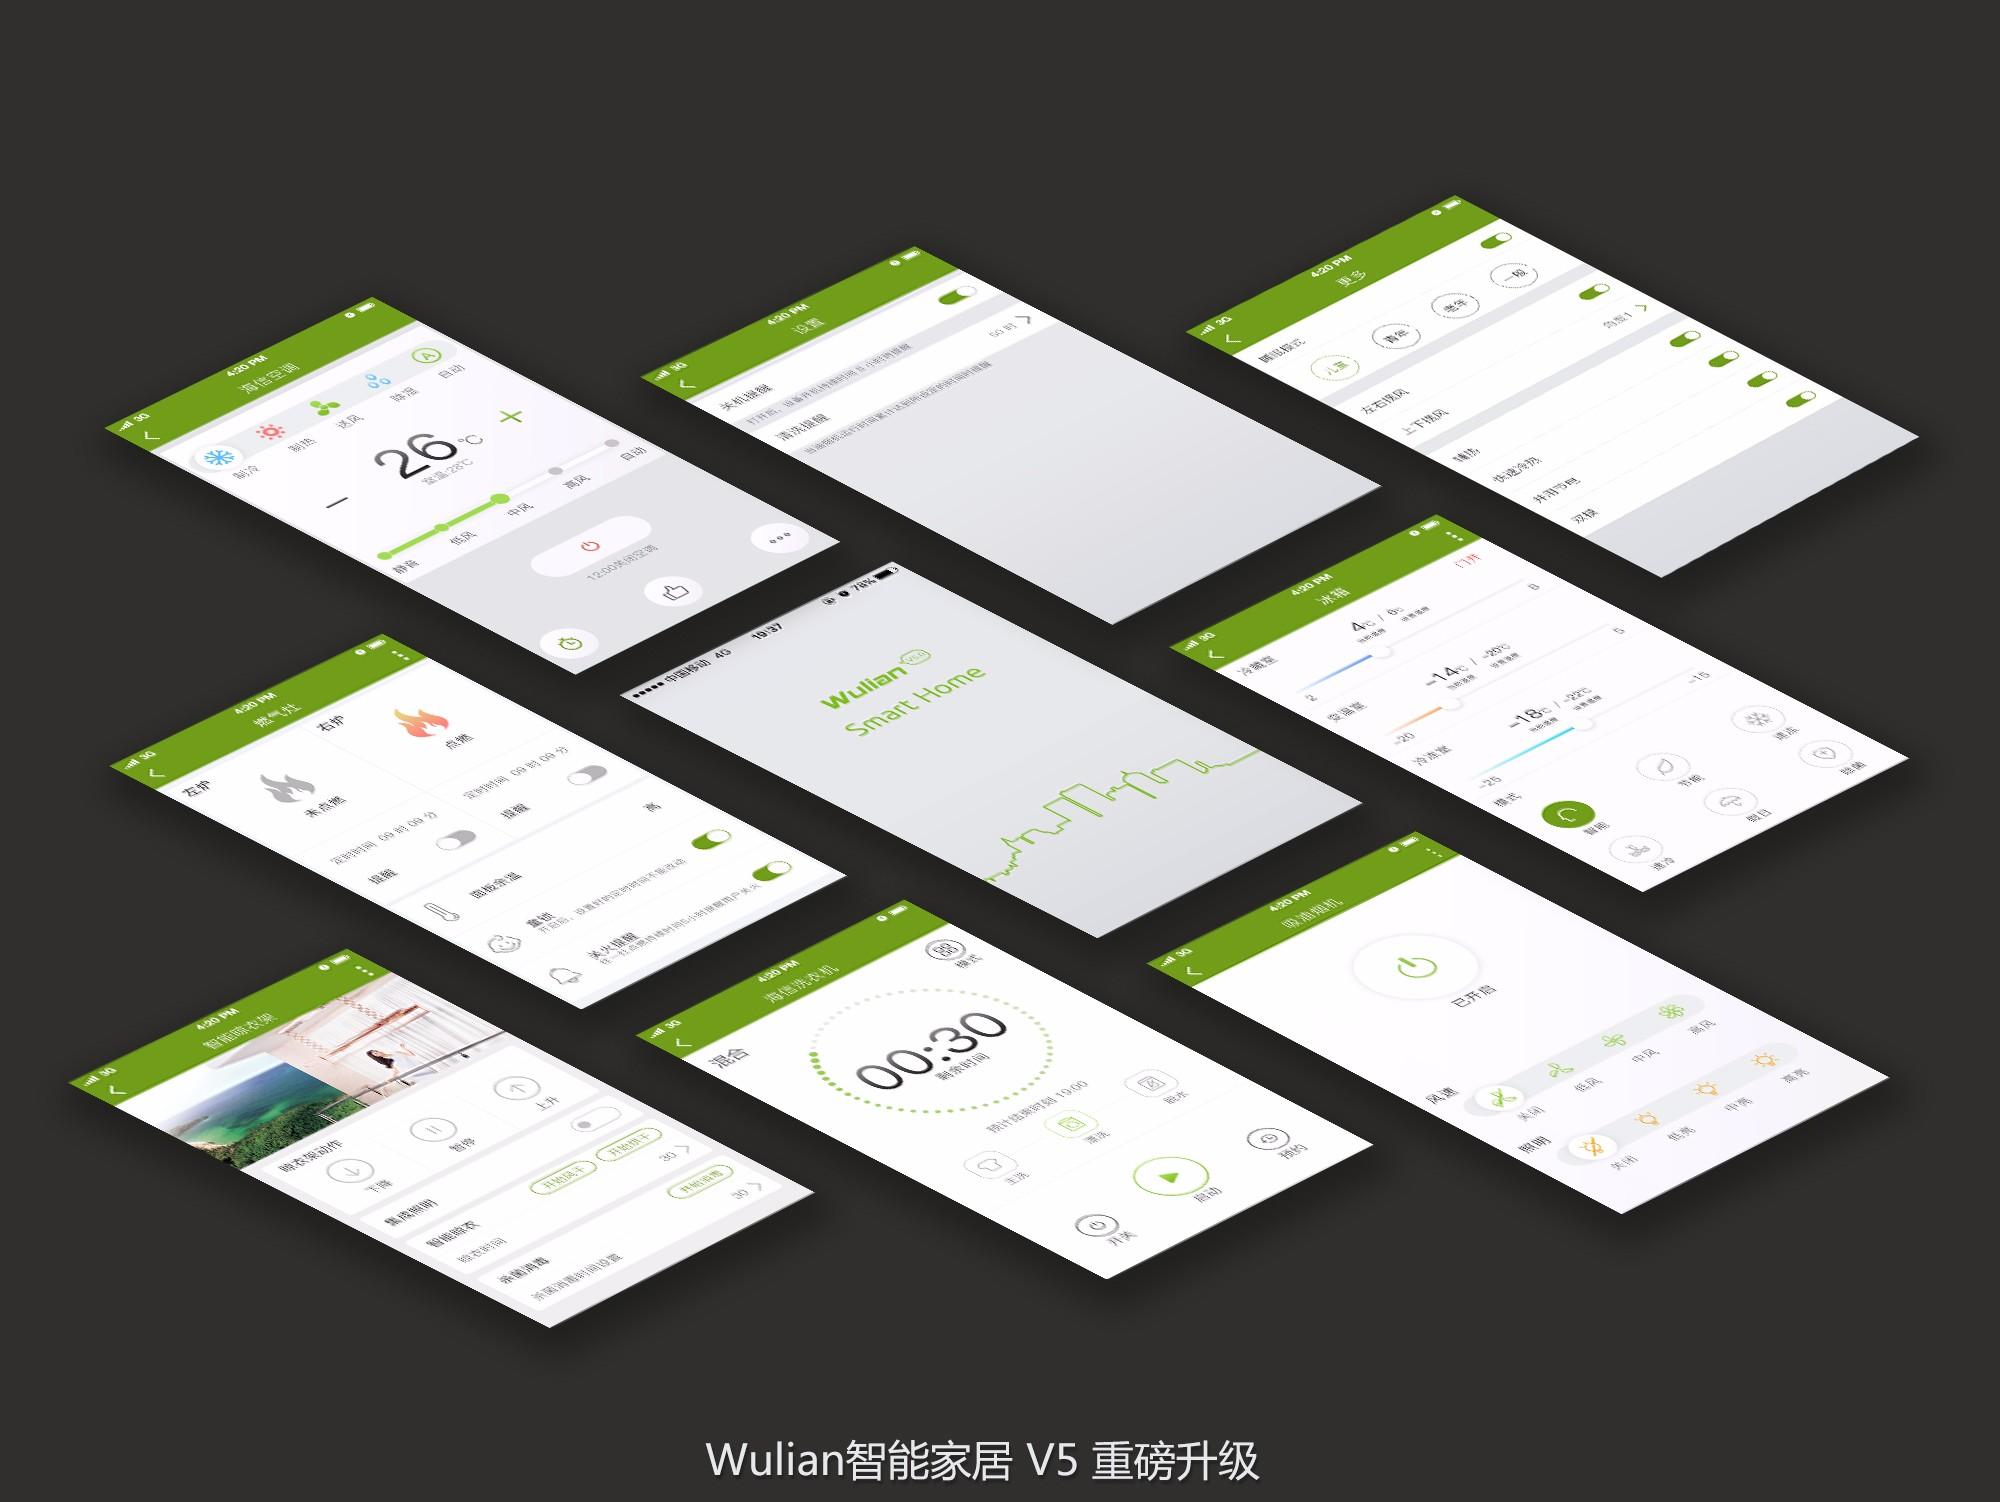 WULIAN智能家居V5重磅升级 全面开启智慧家庭全互联时代6.jpg